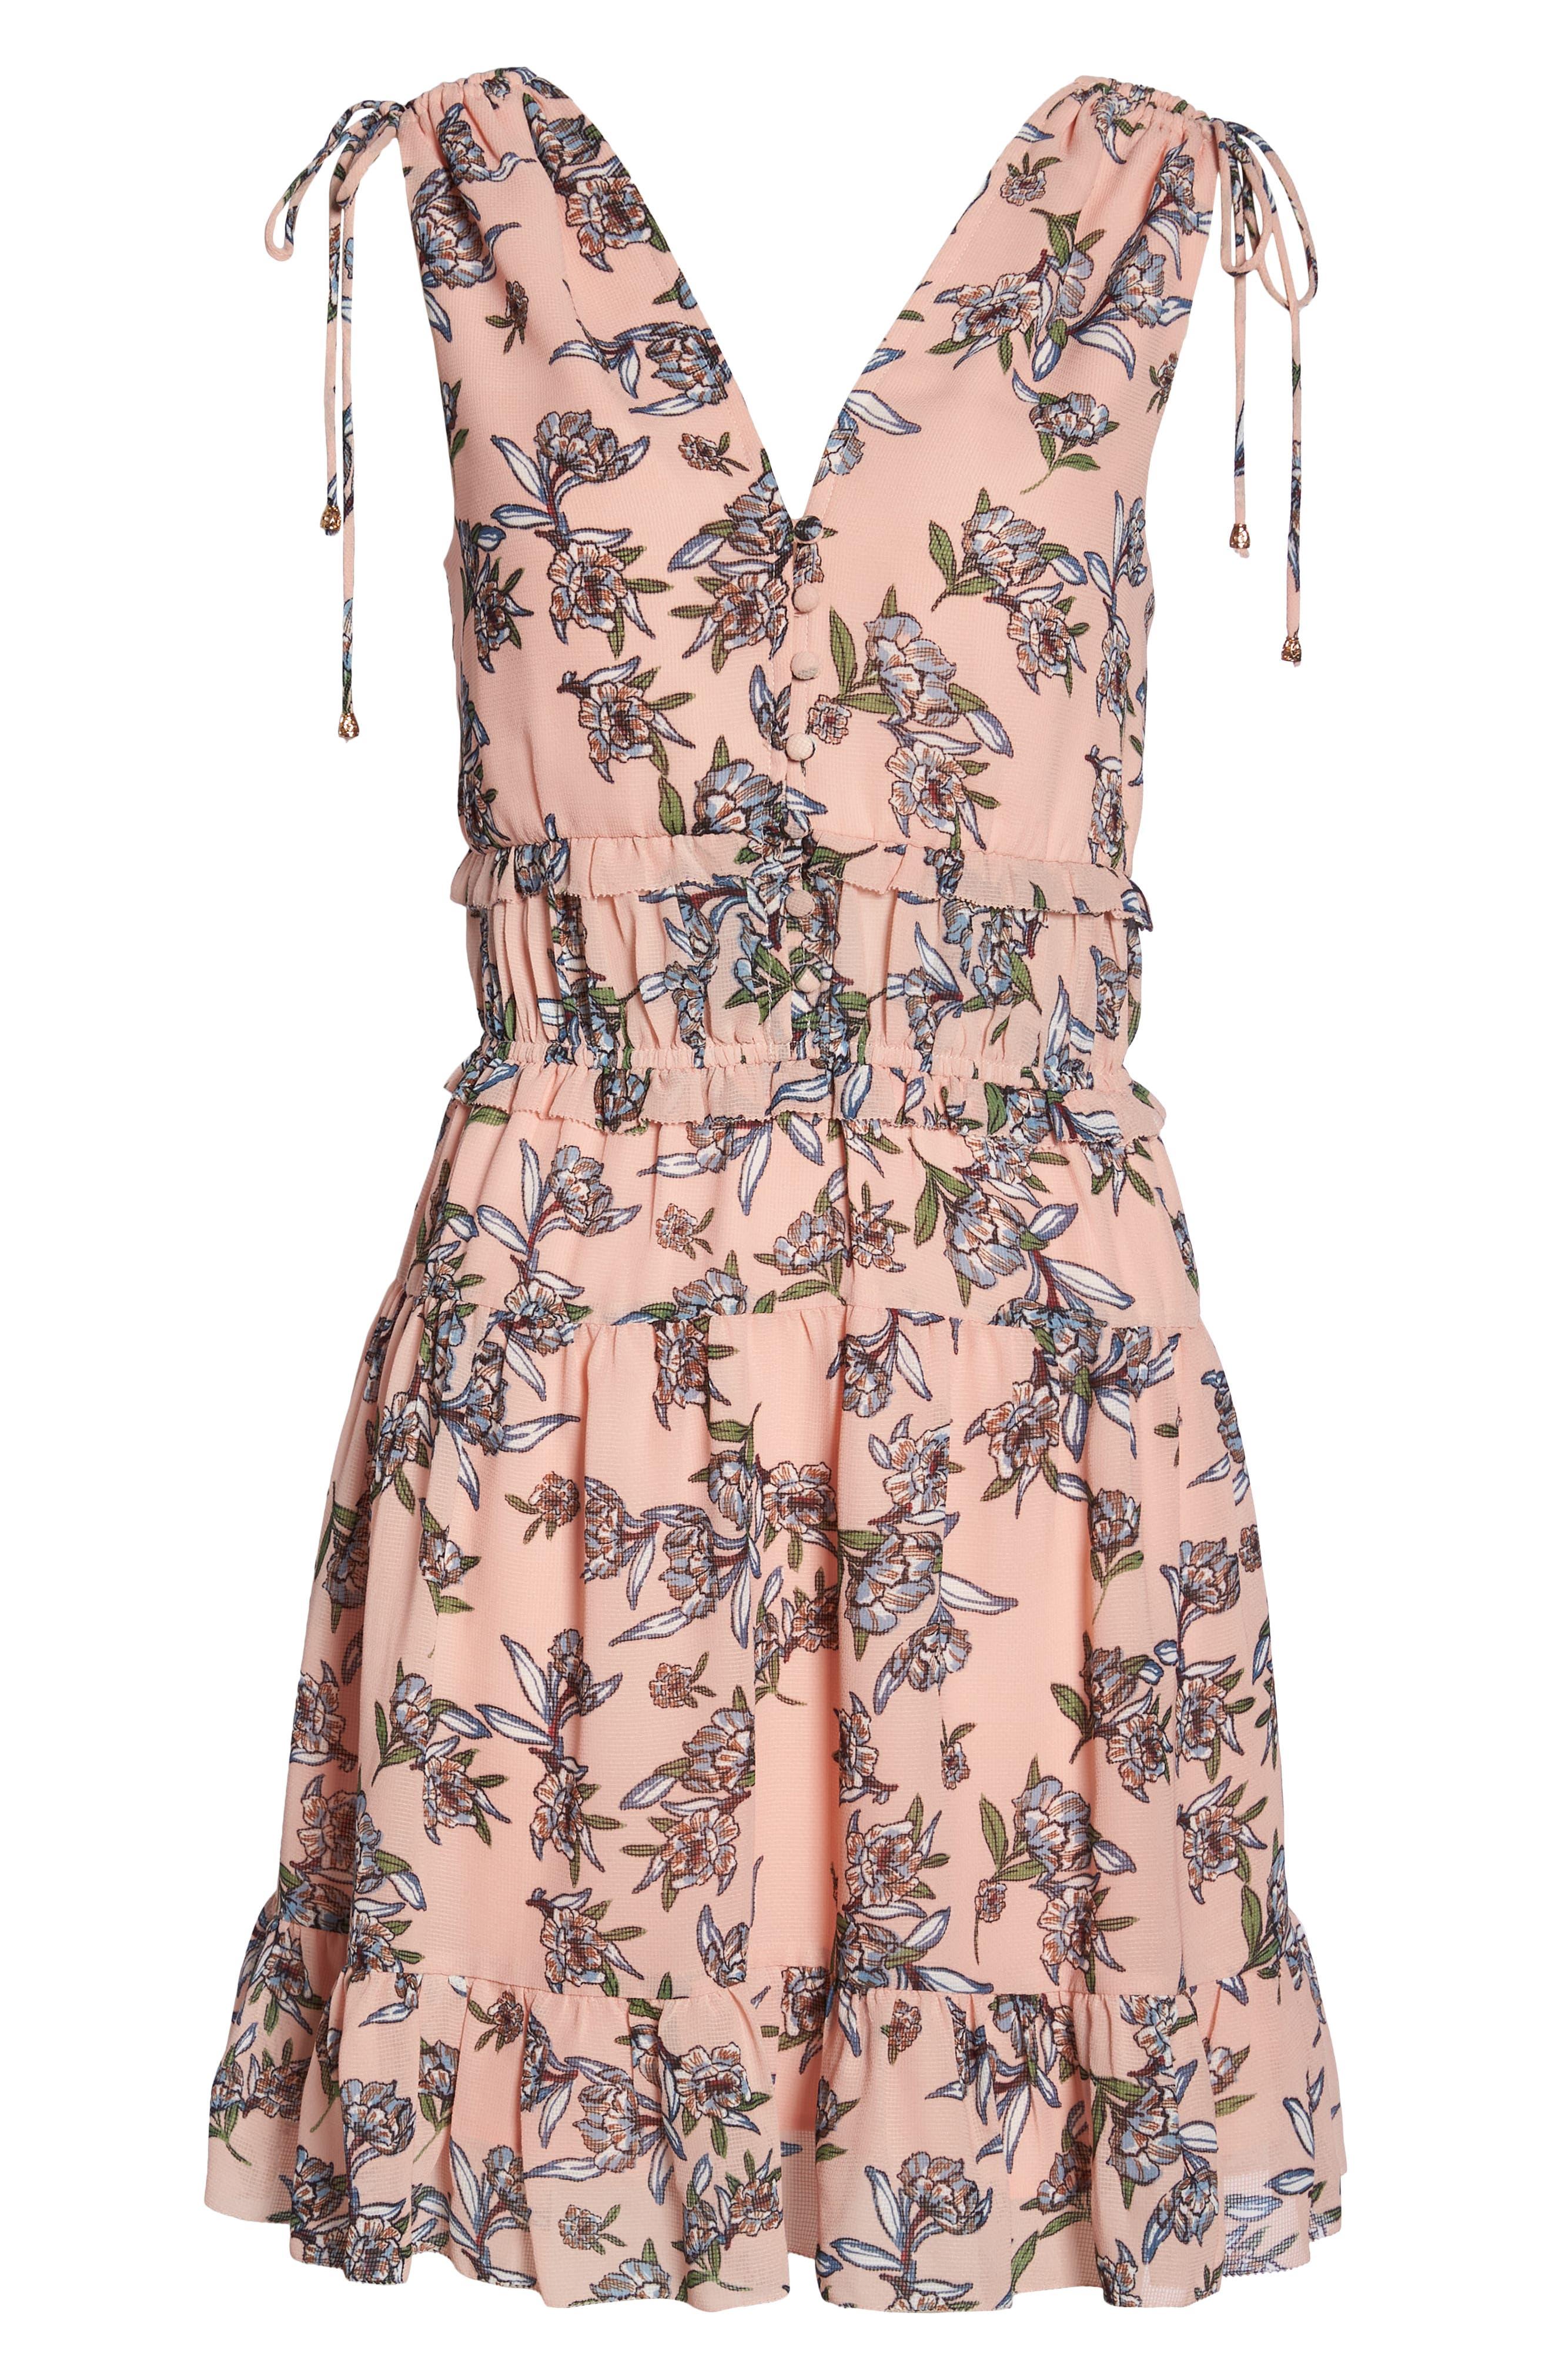 Jax Floral Dress,                             Alternate thumbnail 7, color,                             Blush